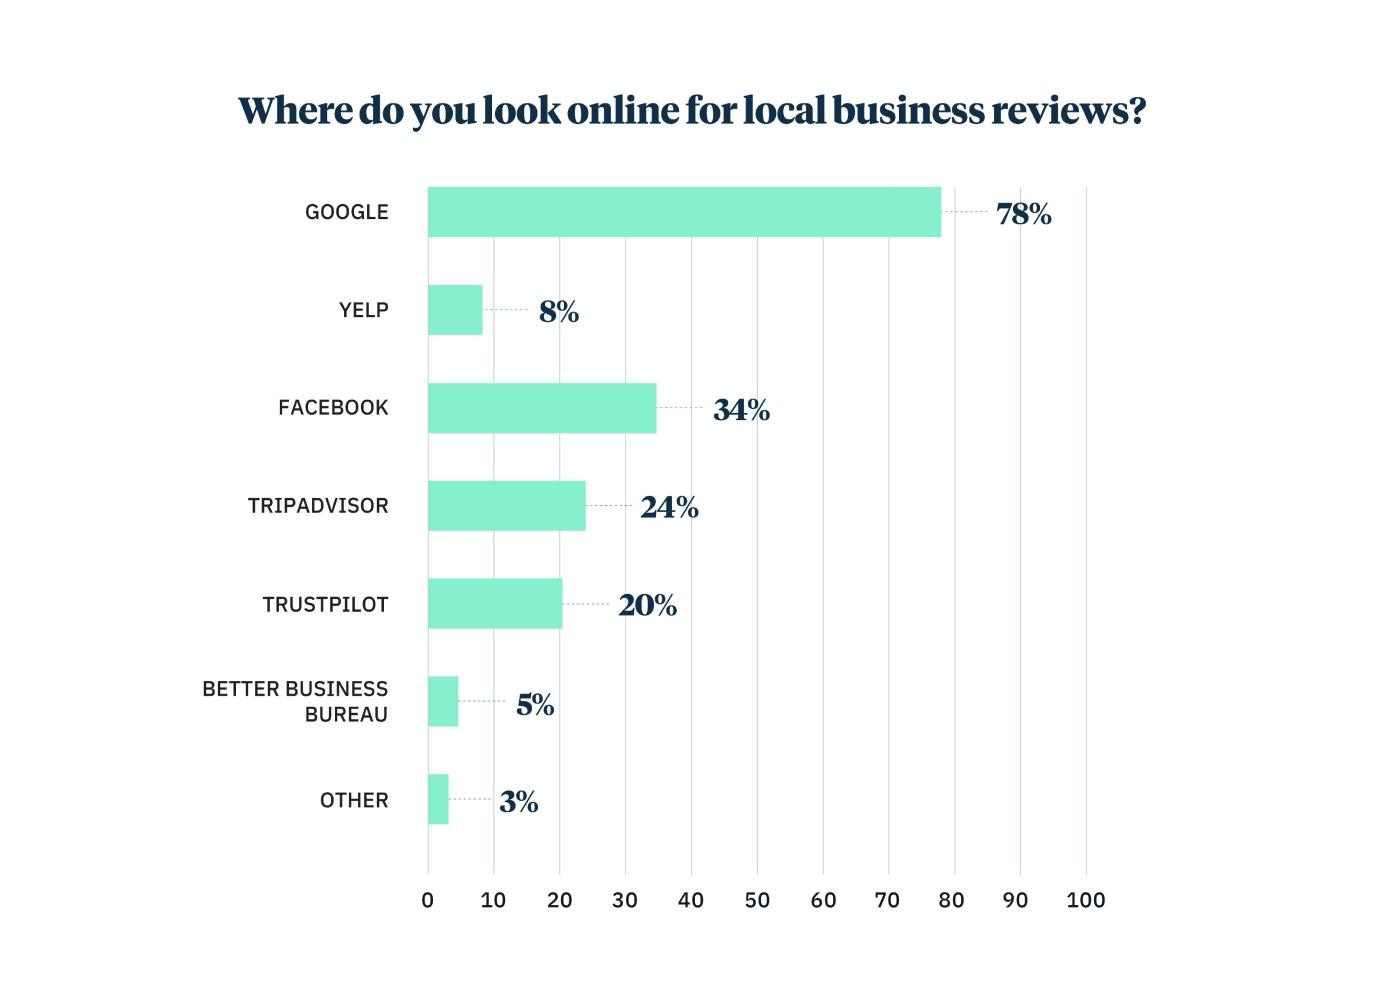 Consumer survey reveals percentage of local business reviews